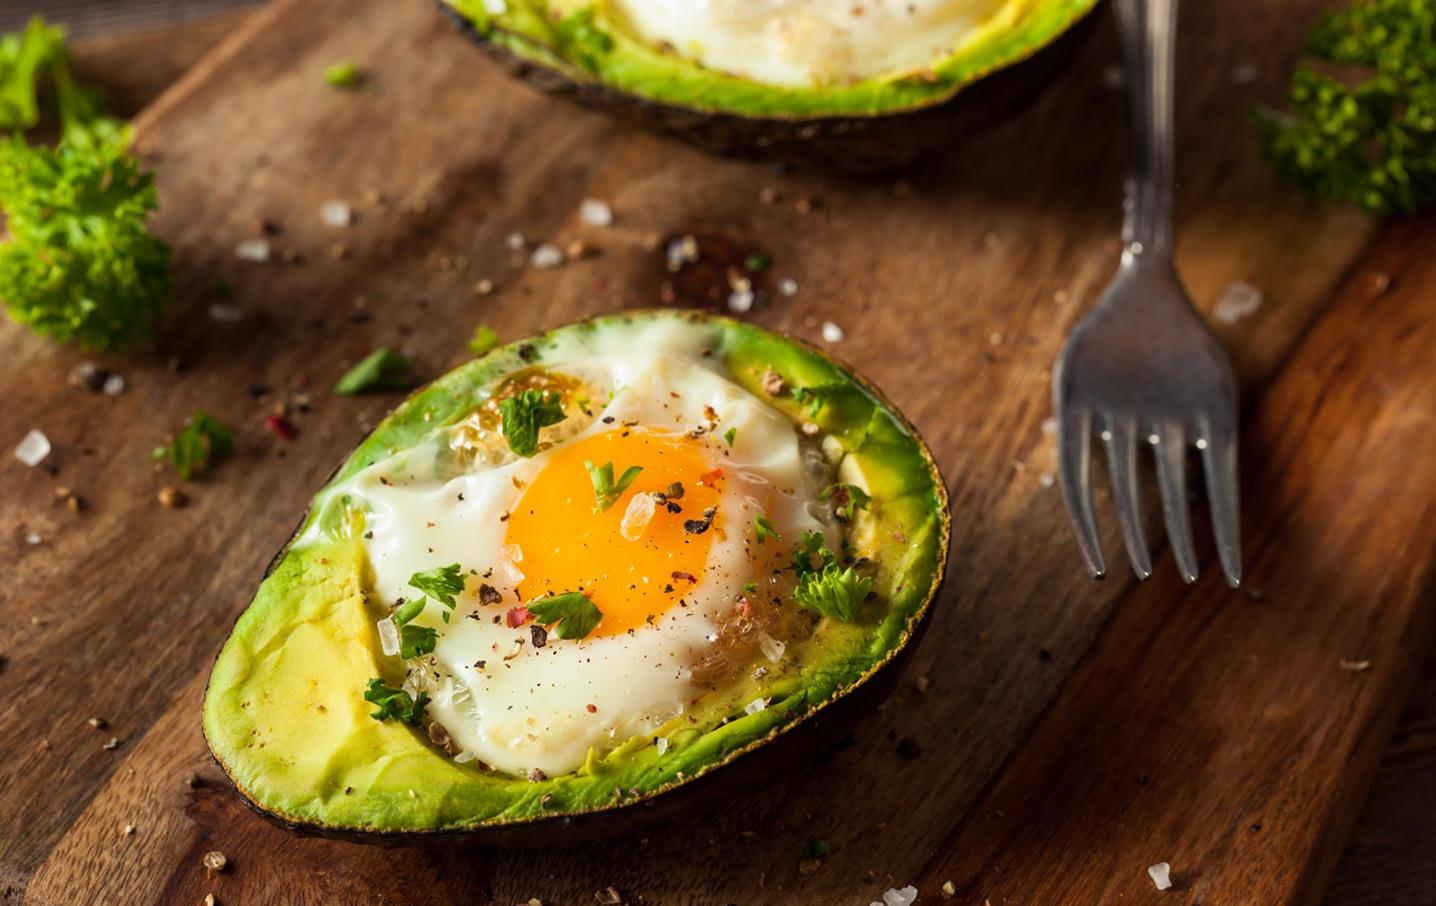 Baked Avocado and egg recipe